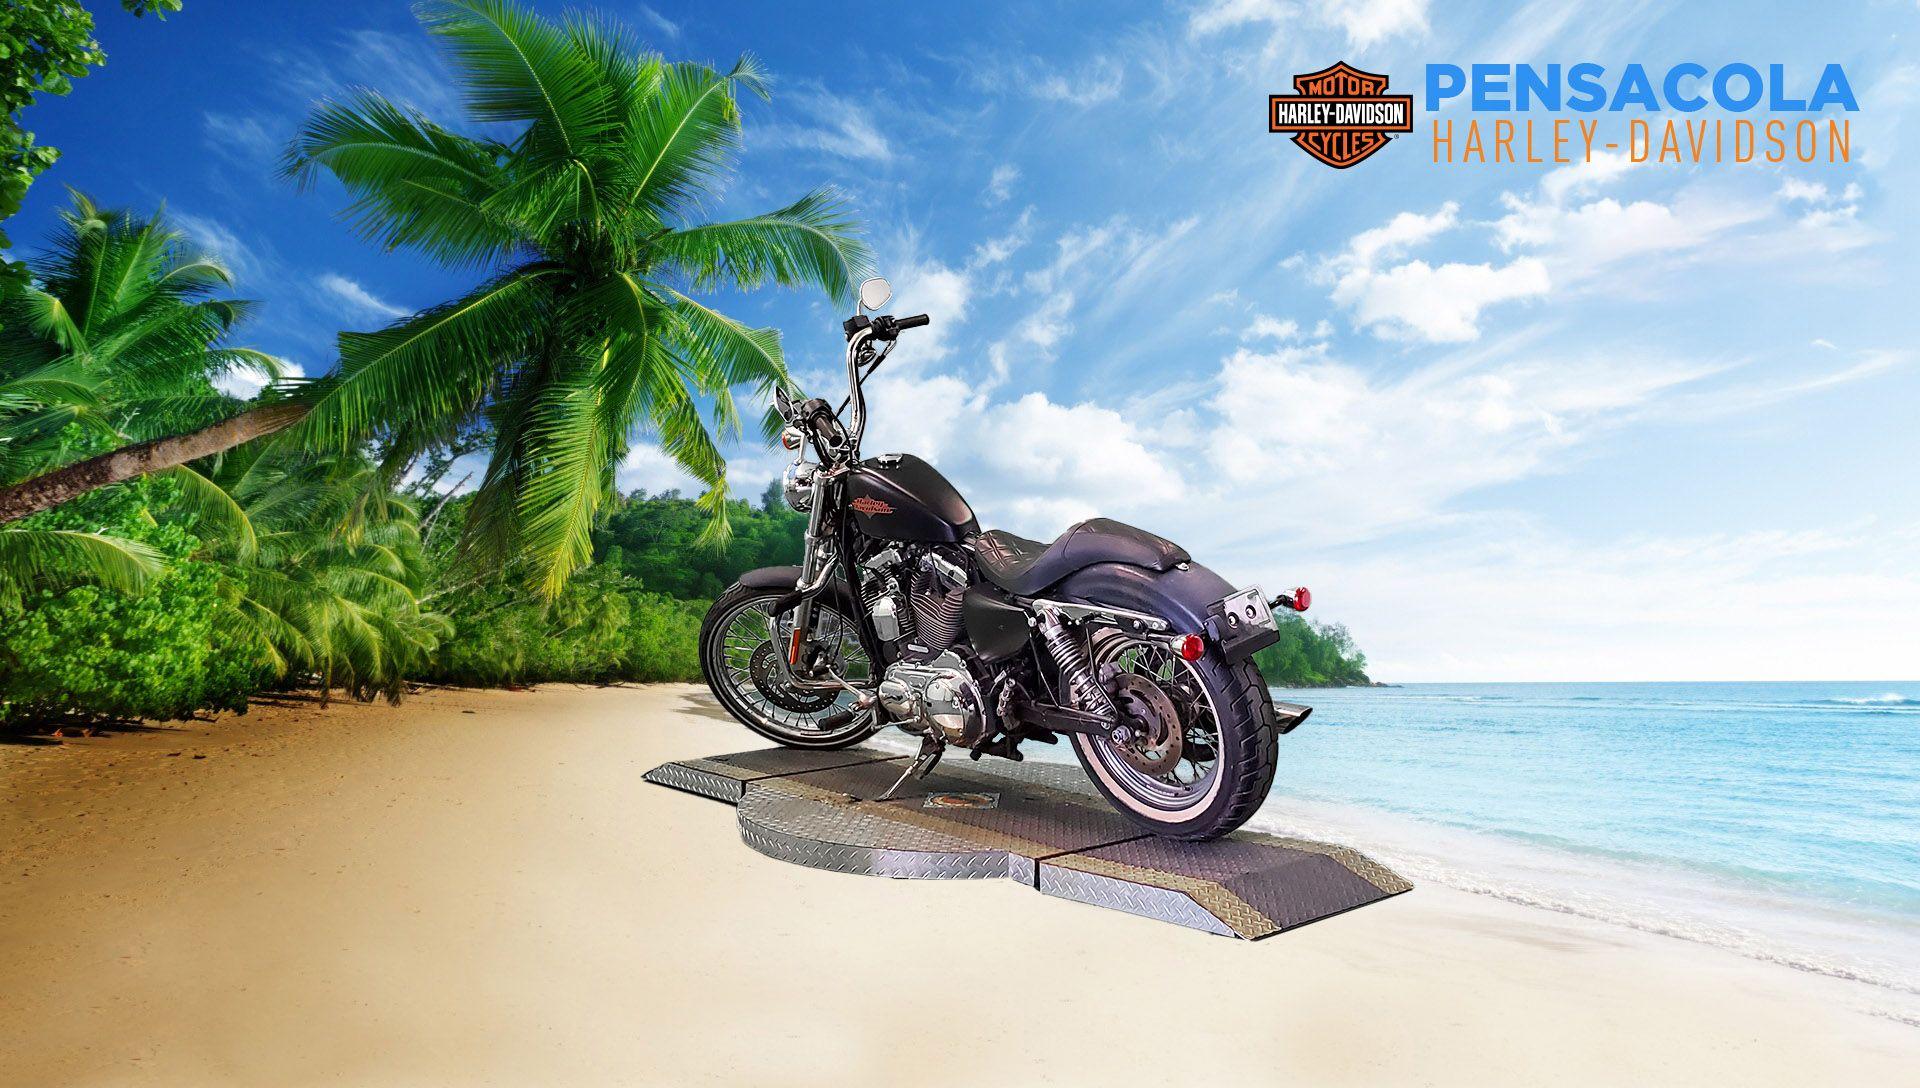 Pre-Owned 2016 Harley-Davidson Seventy-Two XL1200V